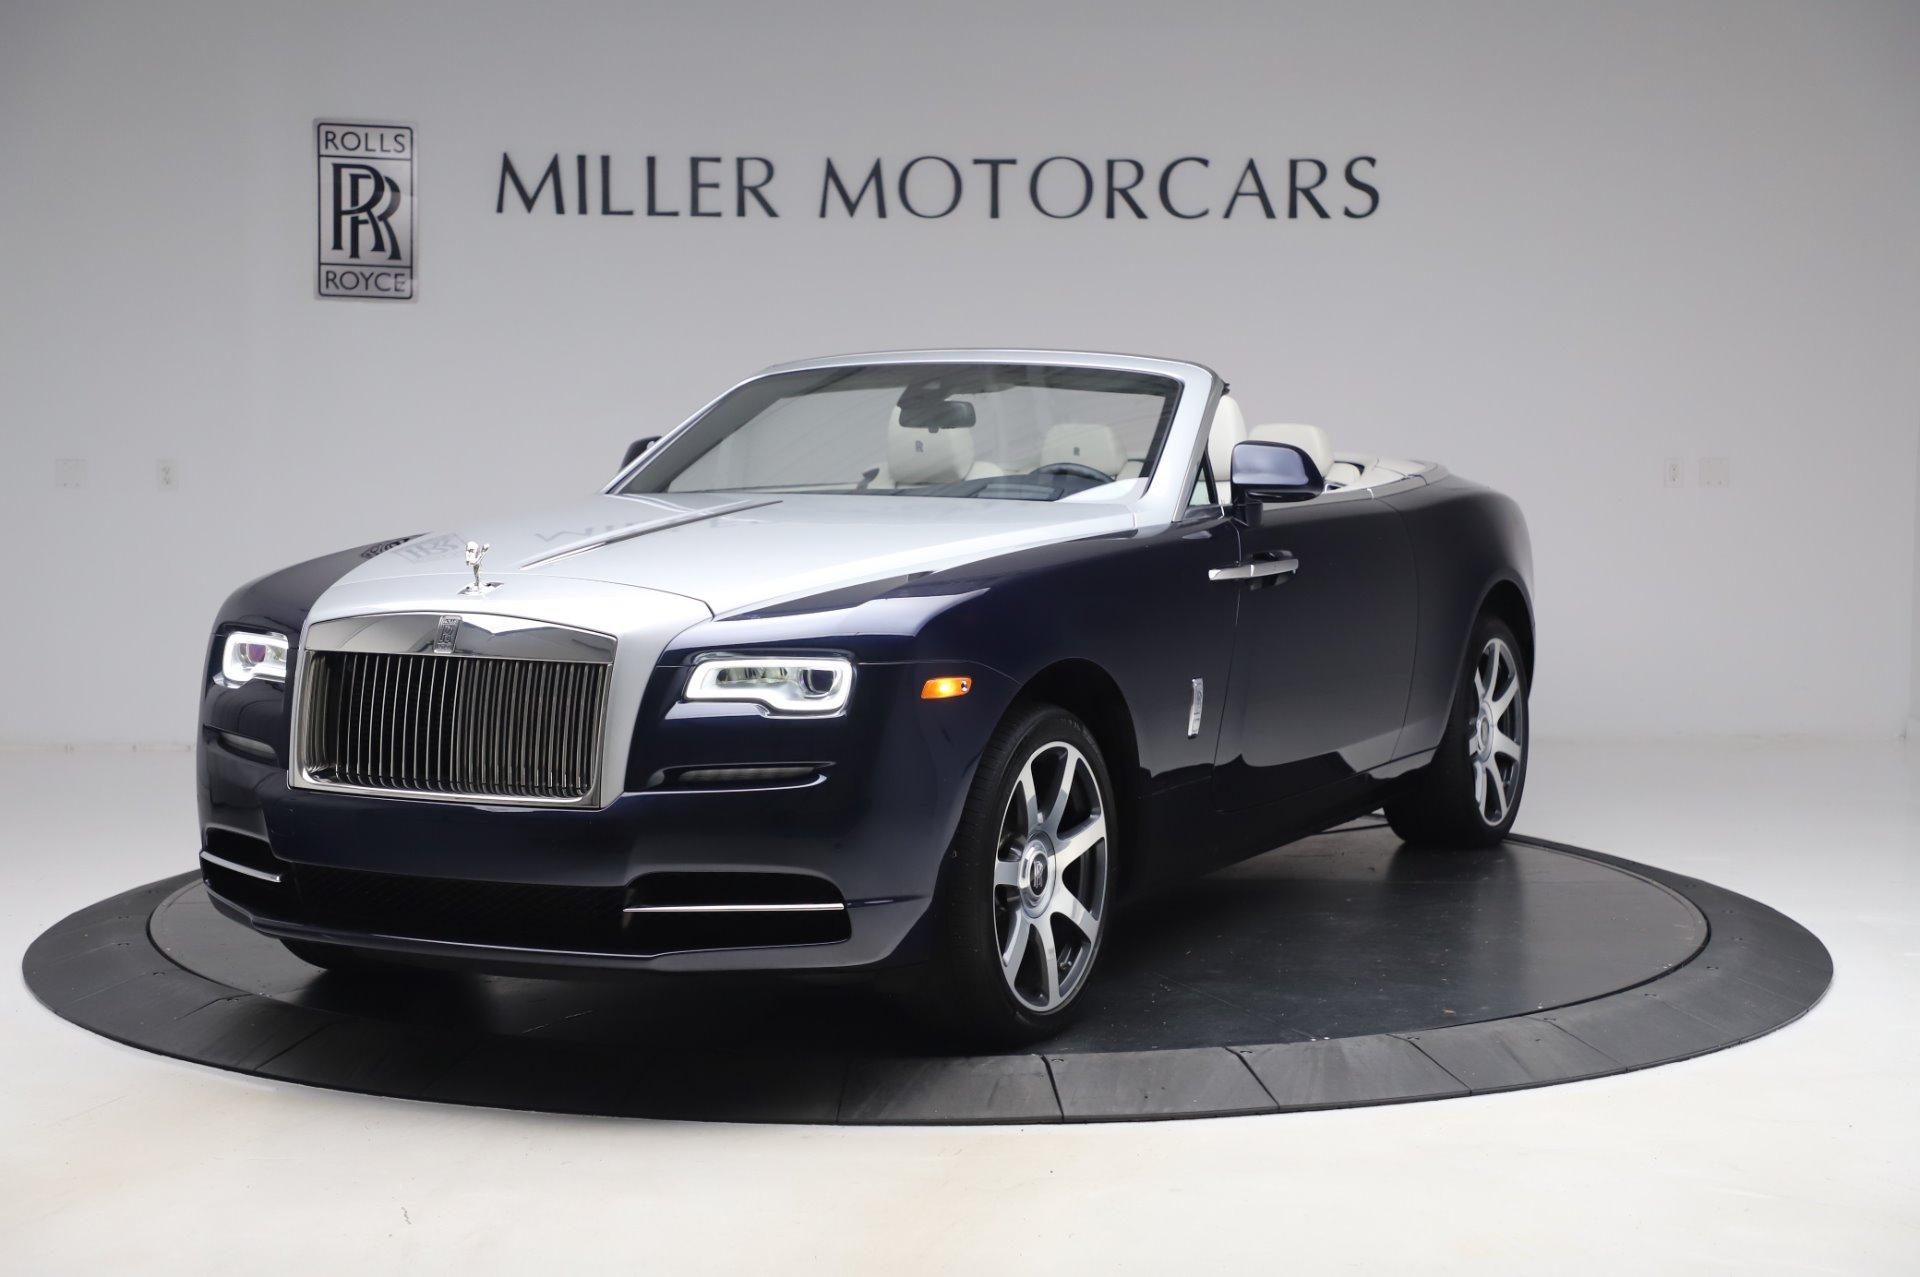 Used 2017 Rolls-Royce Dawn Base for sale $248,900 at Bugatti of Greenwich in Greenwich CT 06830 1